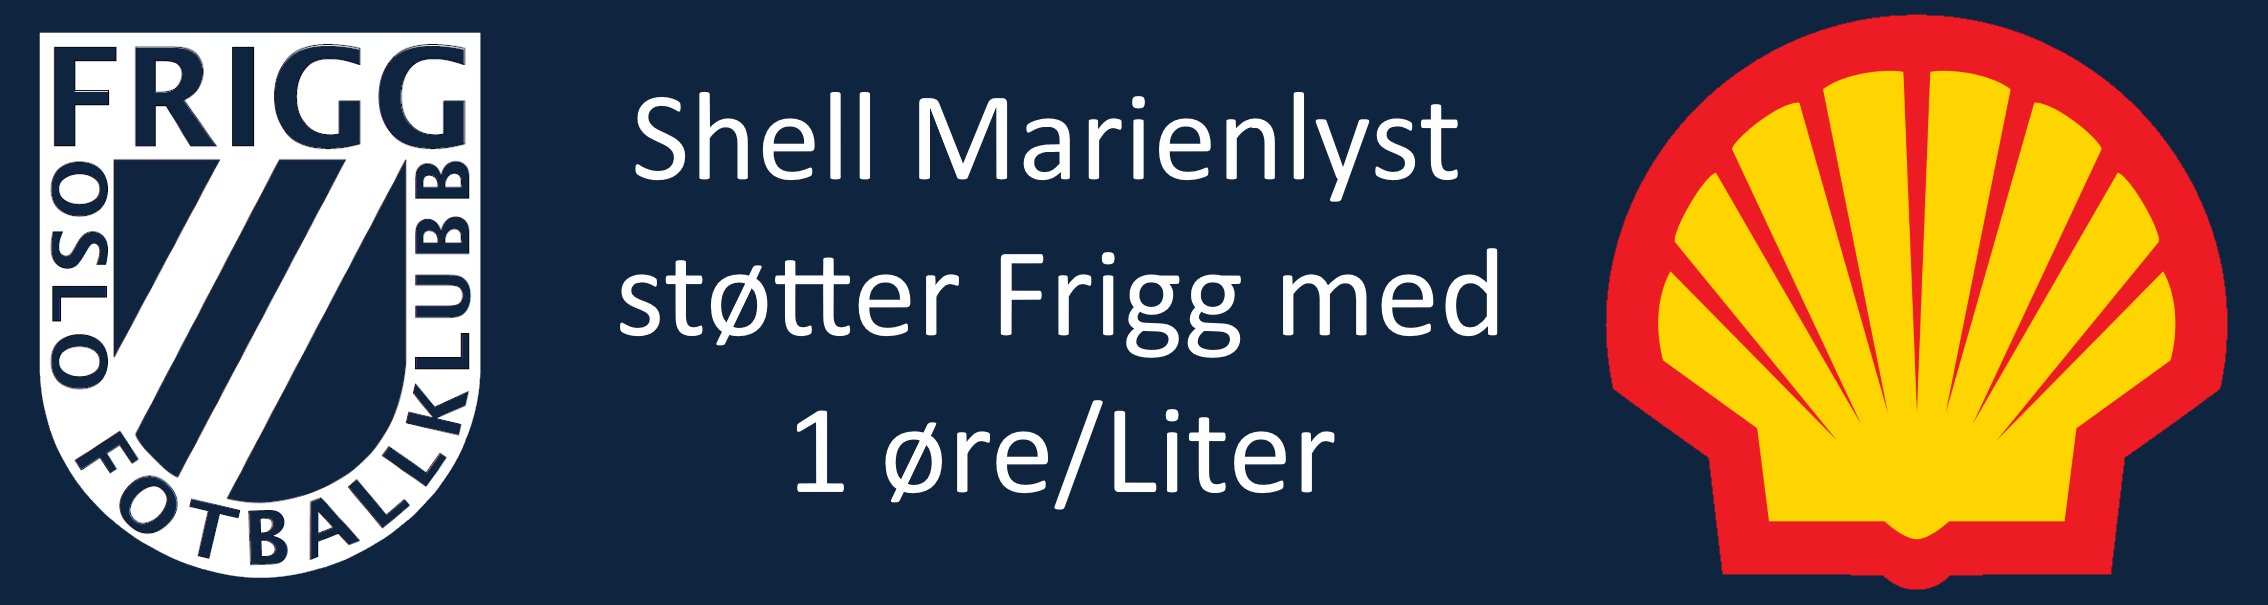 Shell Marienlyst